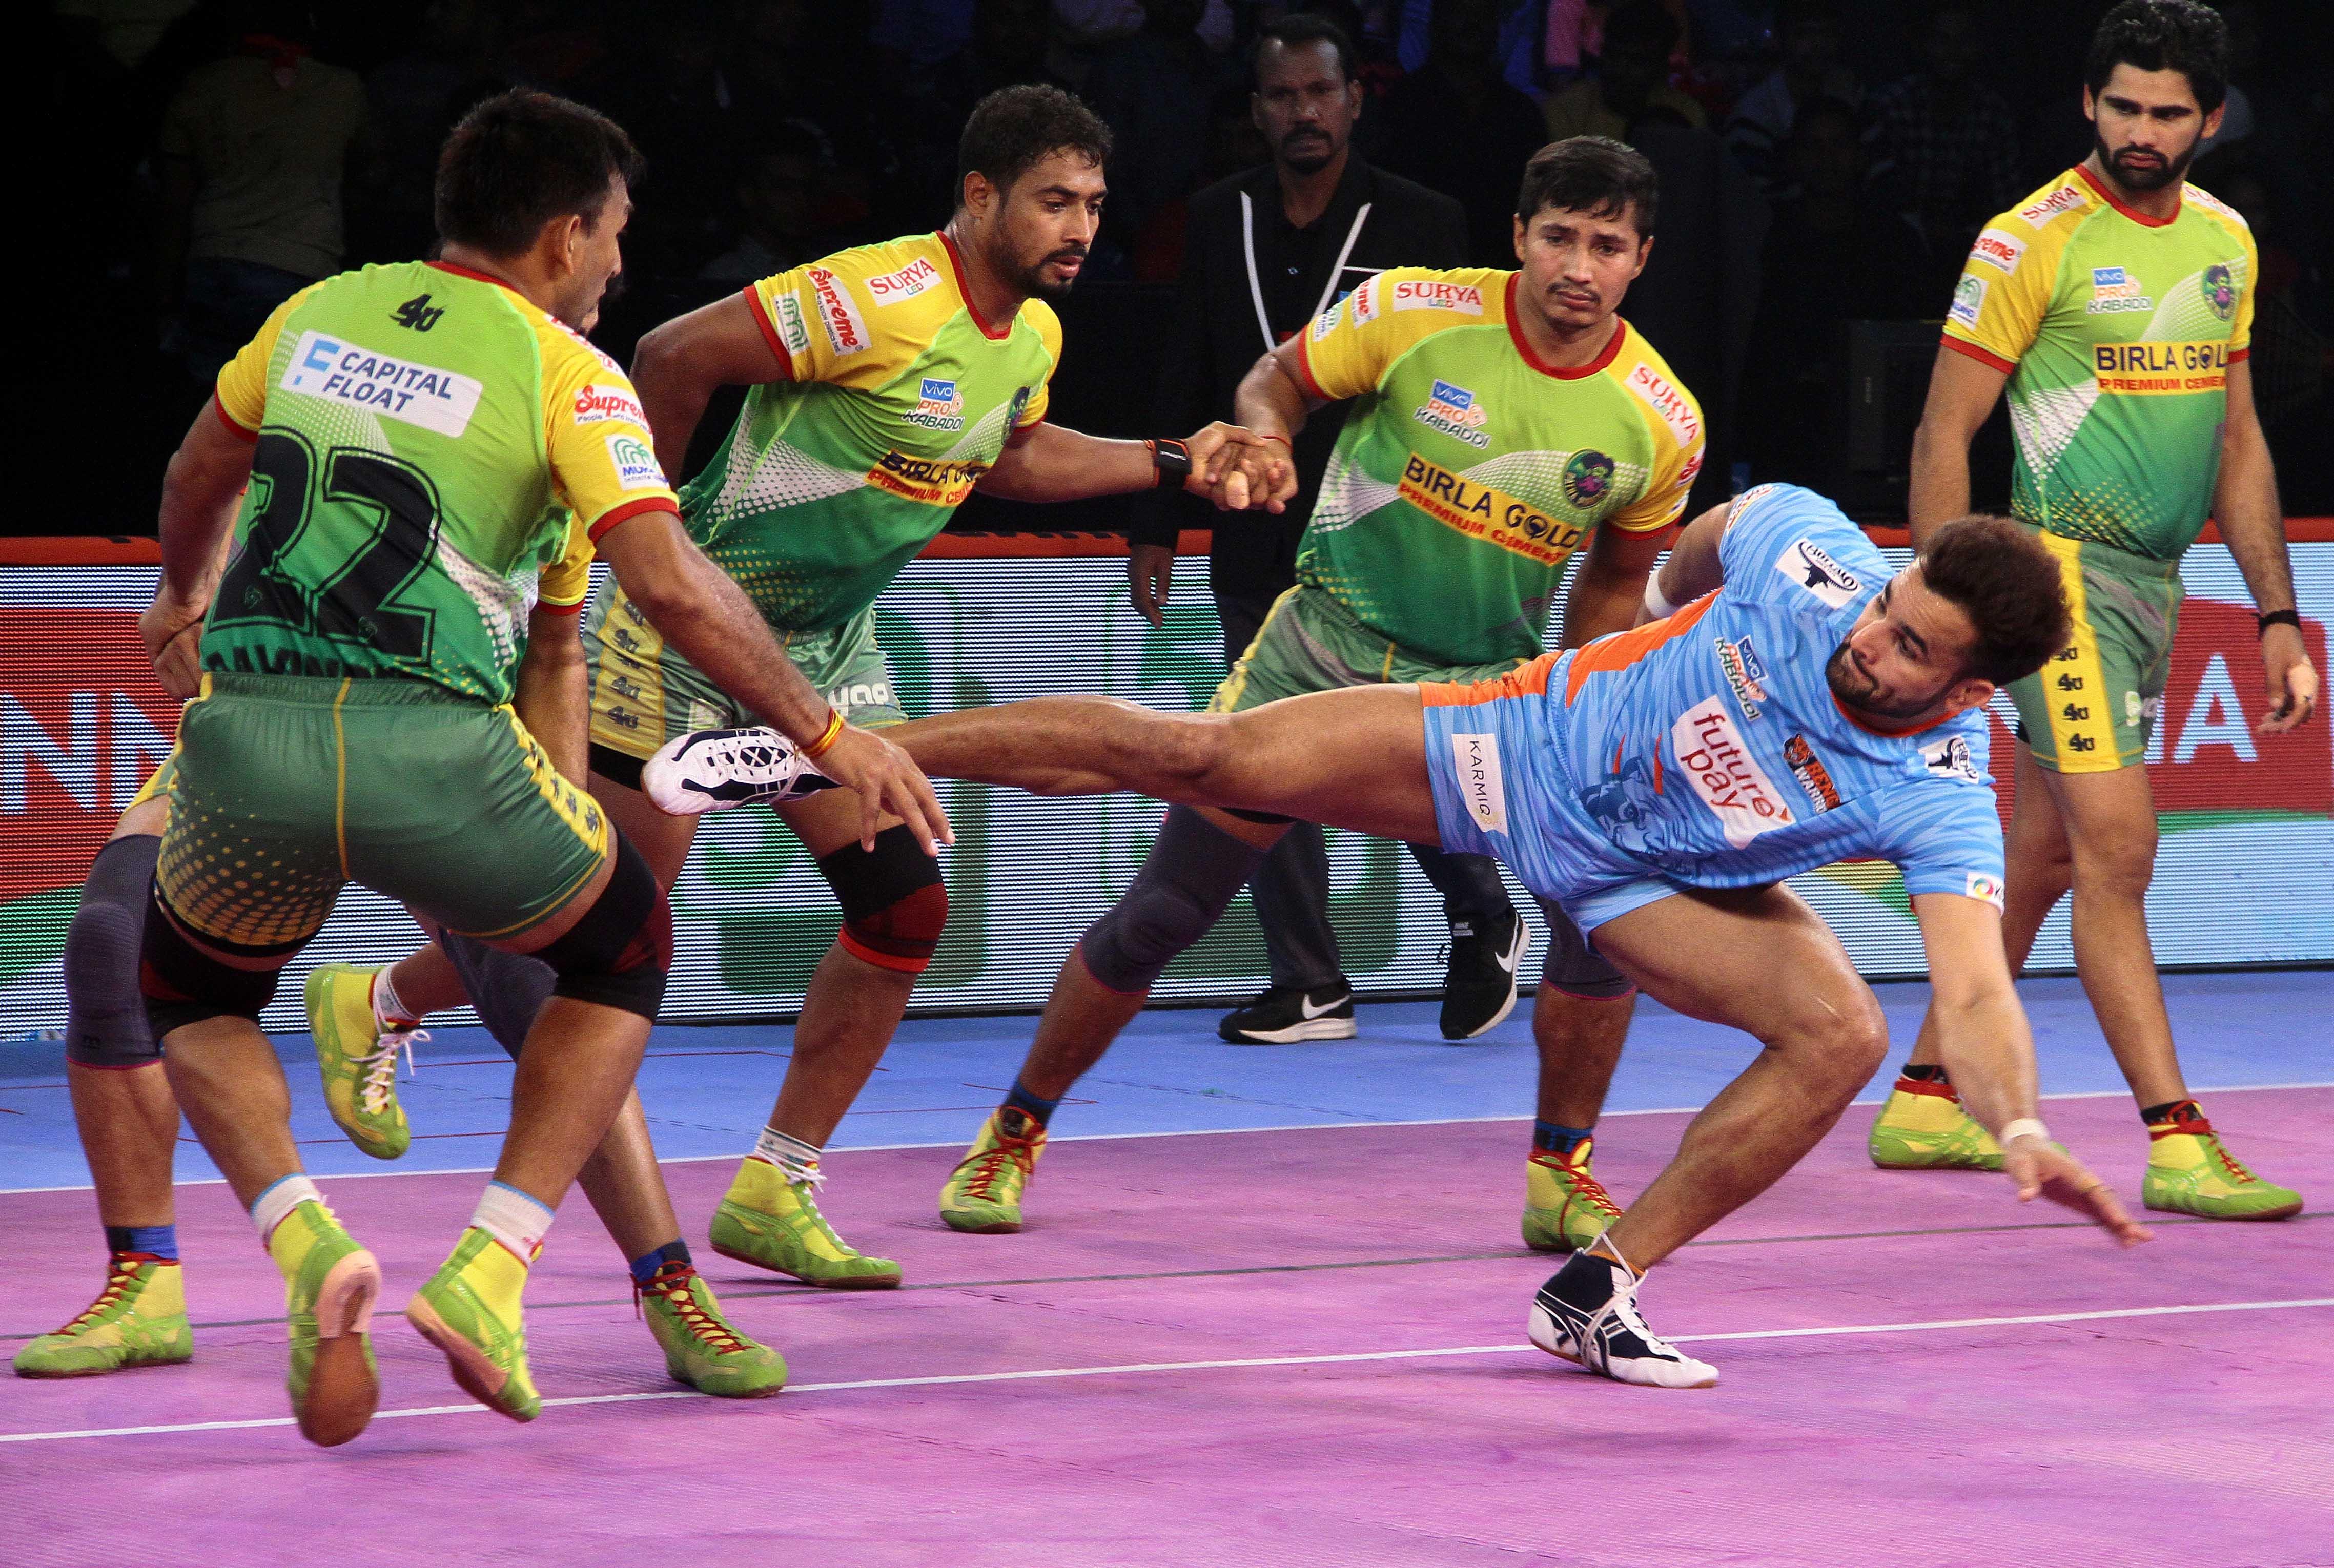 Patna Pirates demolish Bengal Warriors' defense to win by 50-30